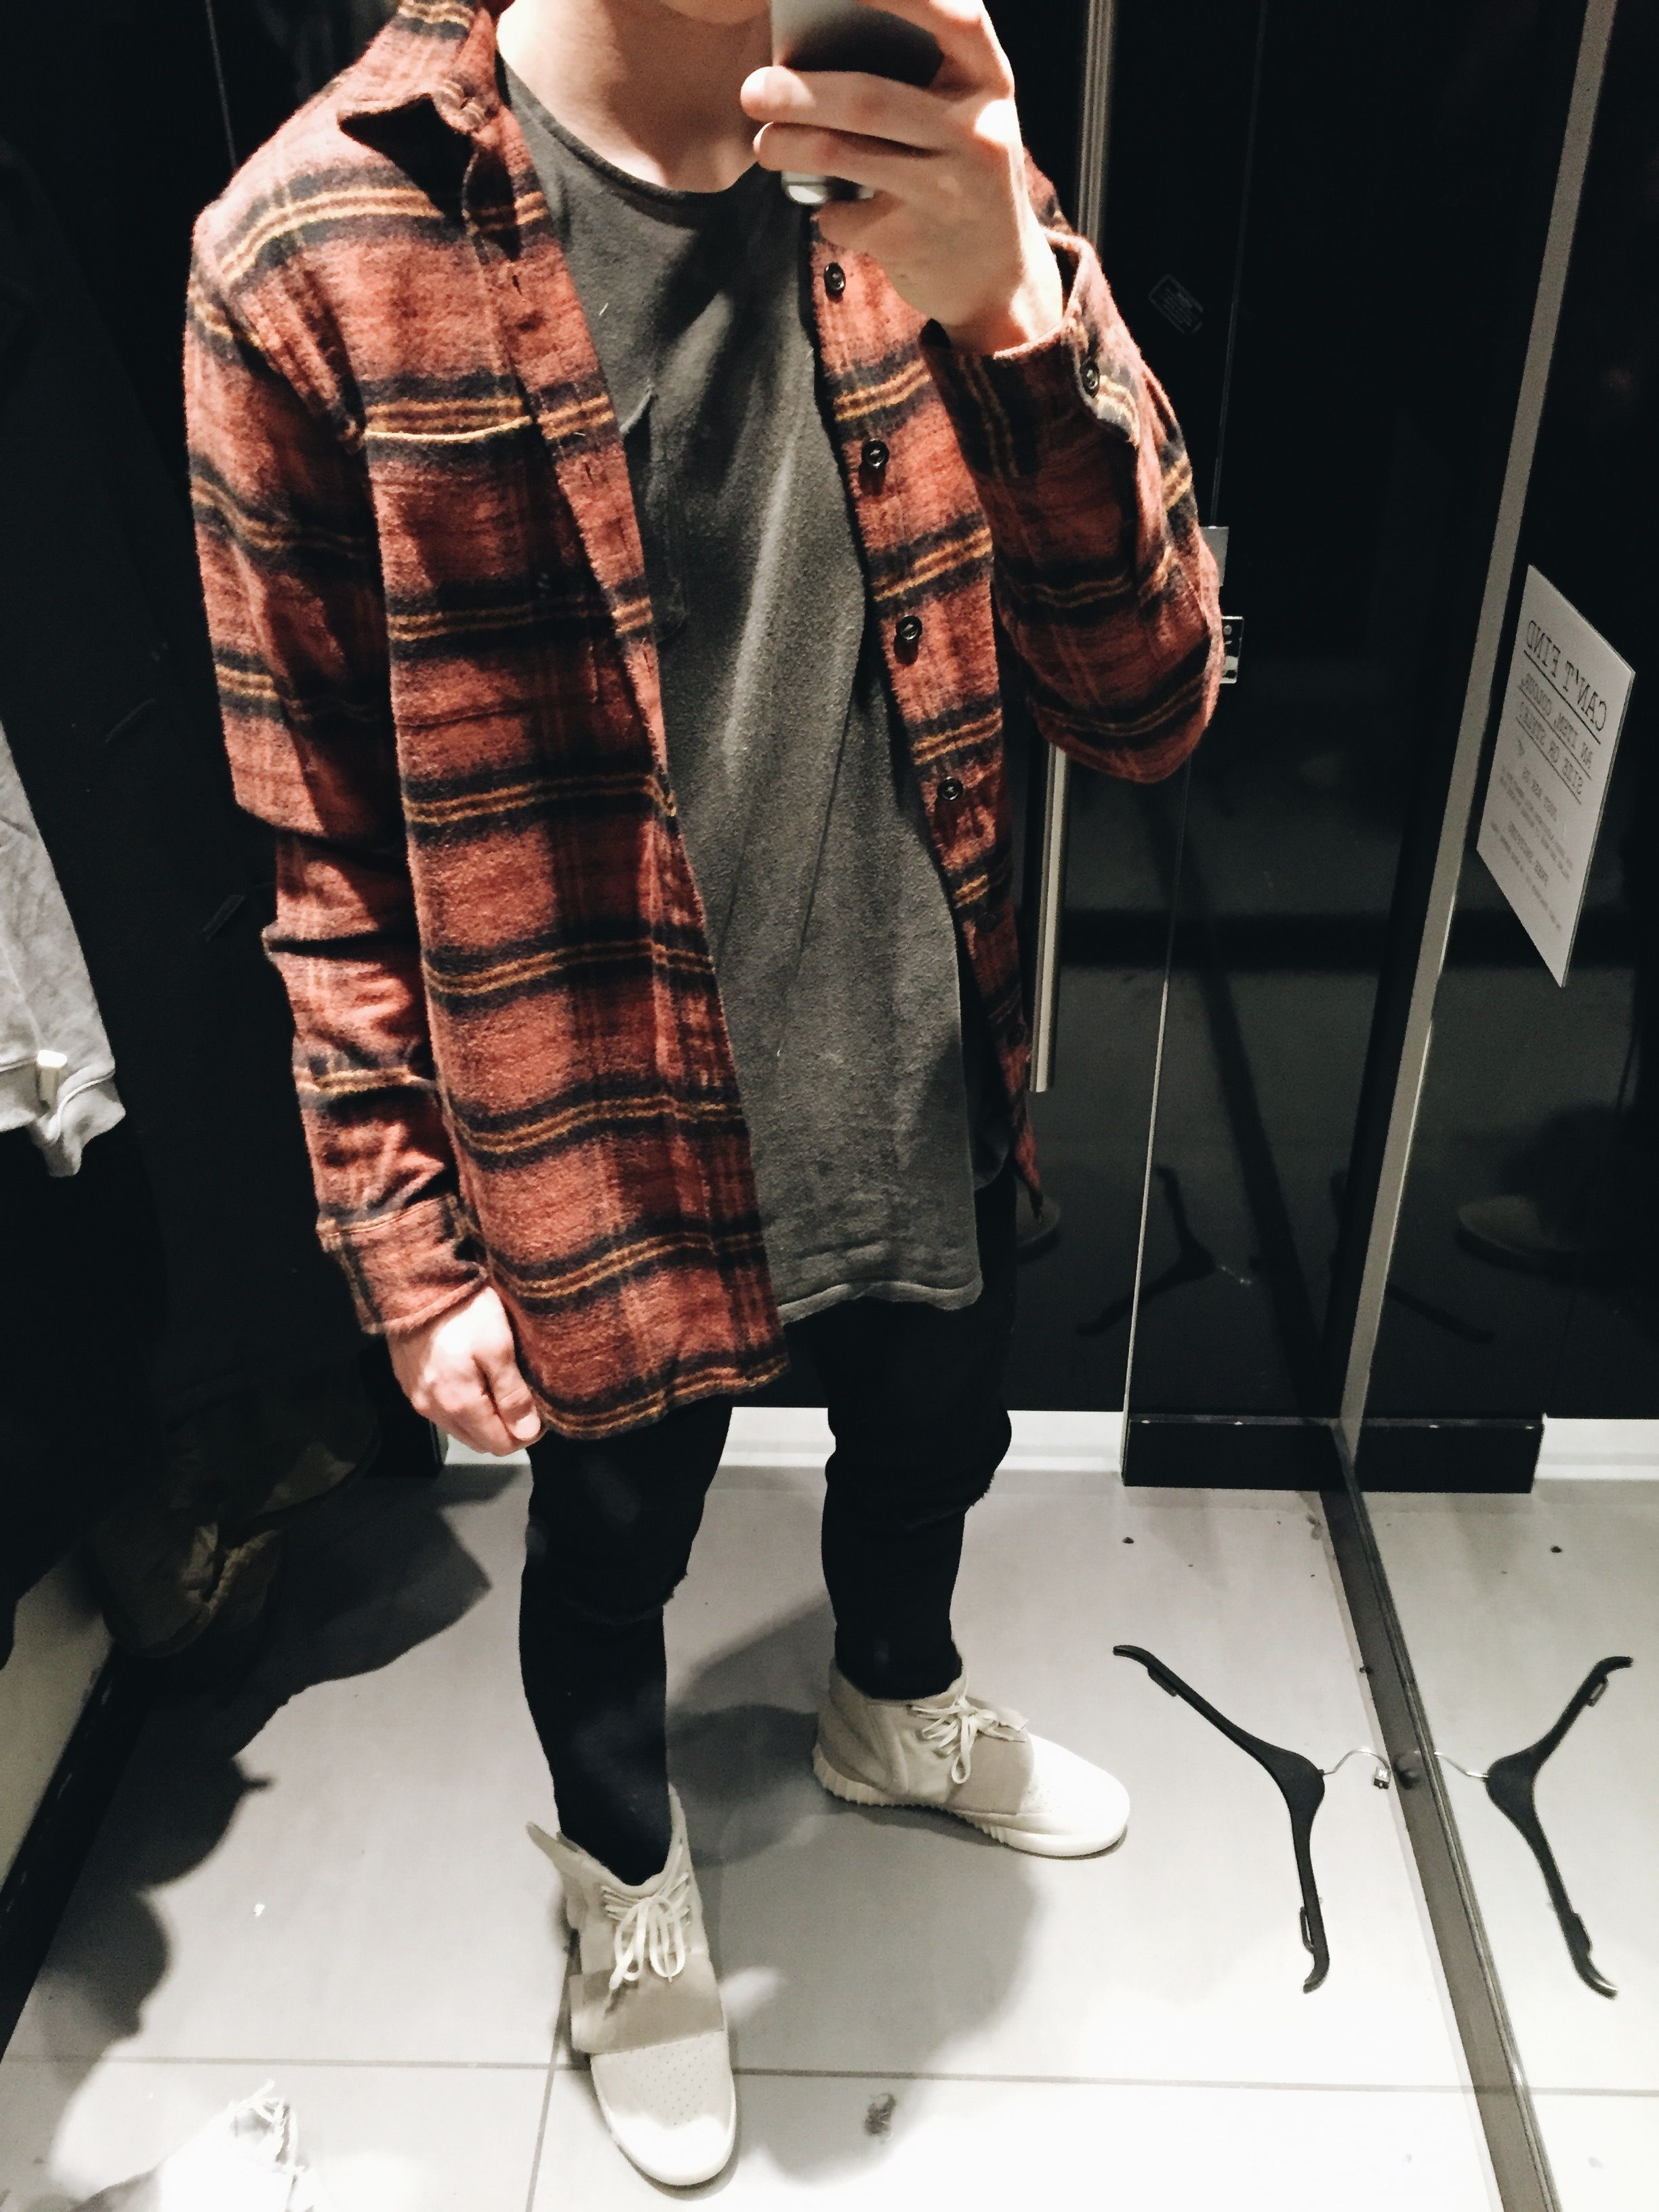 WDYWT - November 30, 2016 : streetwear